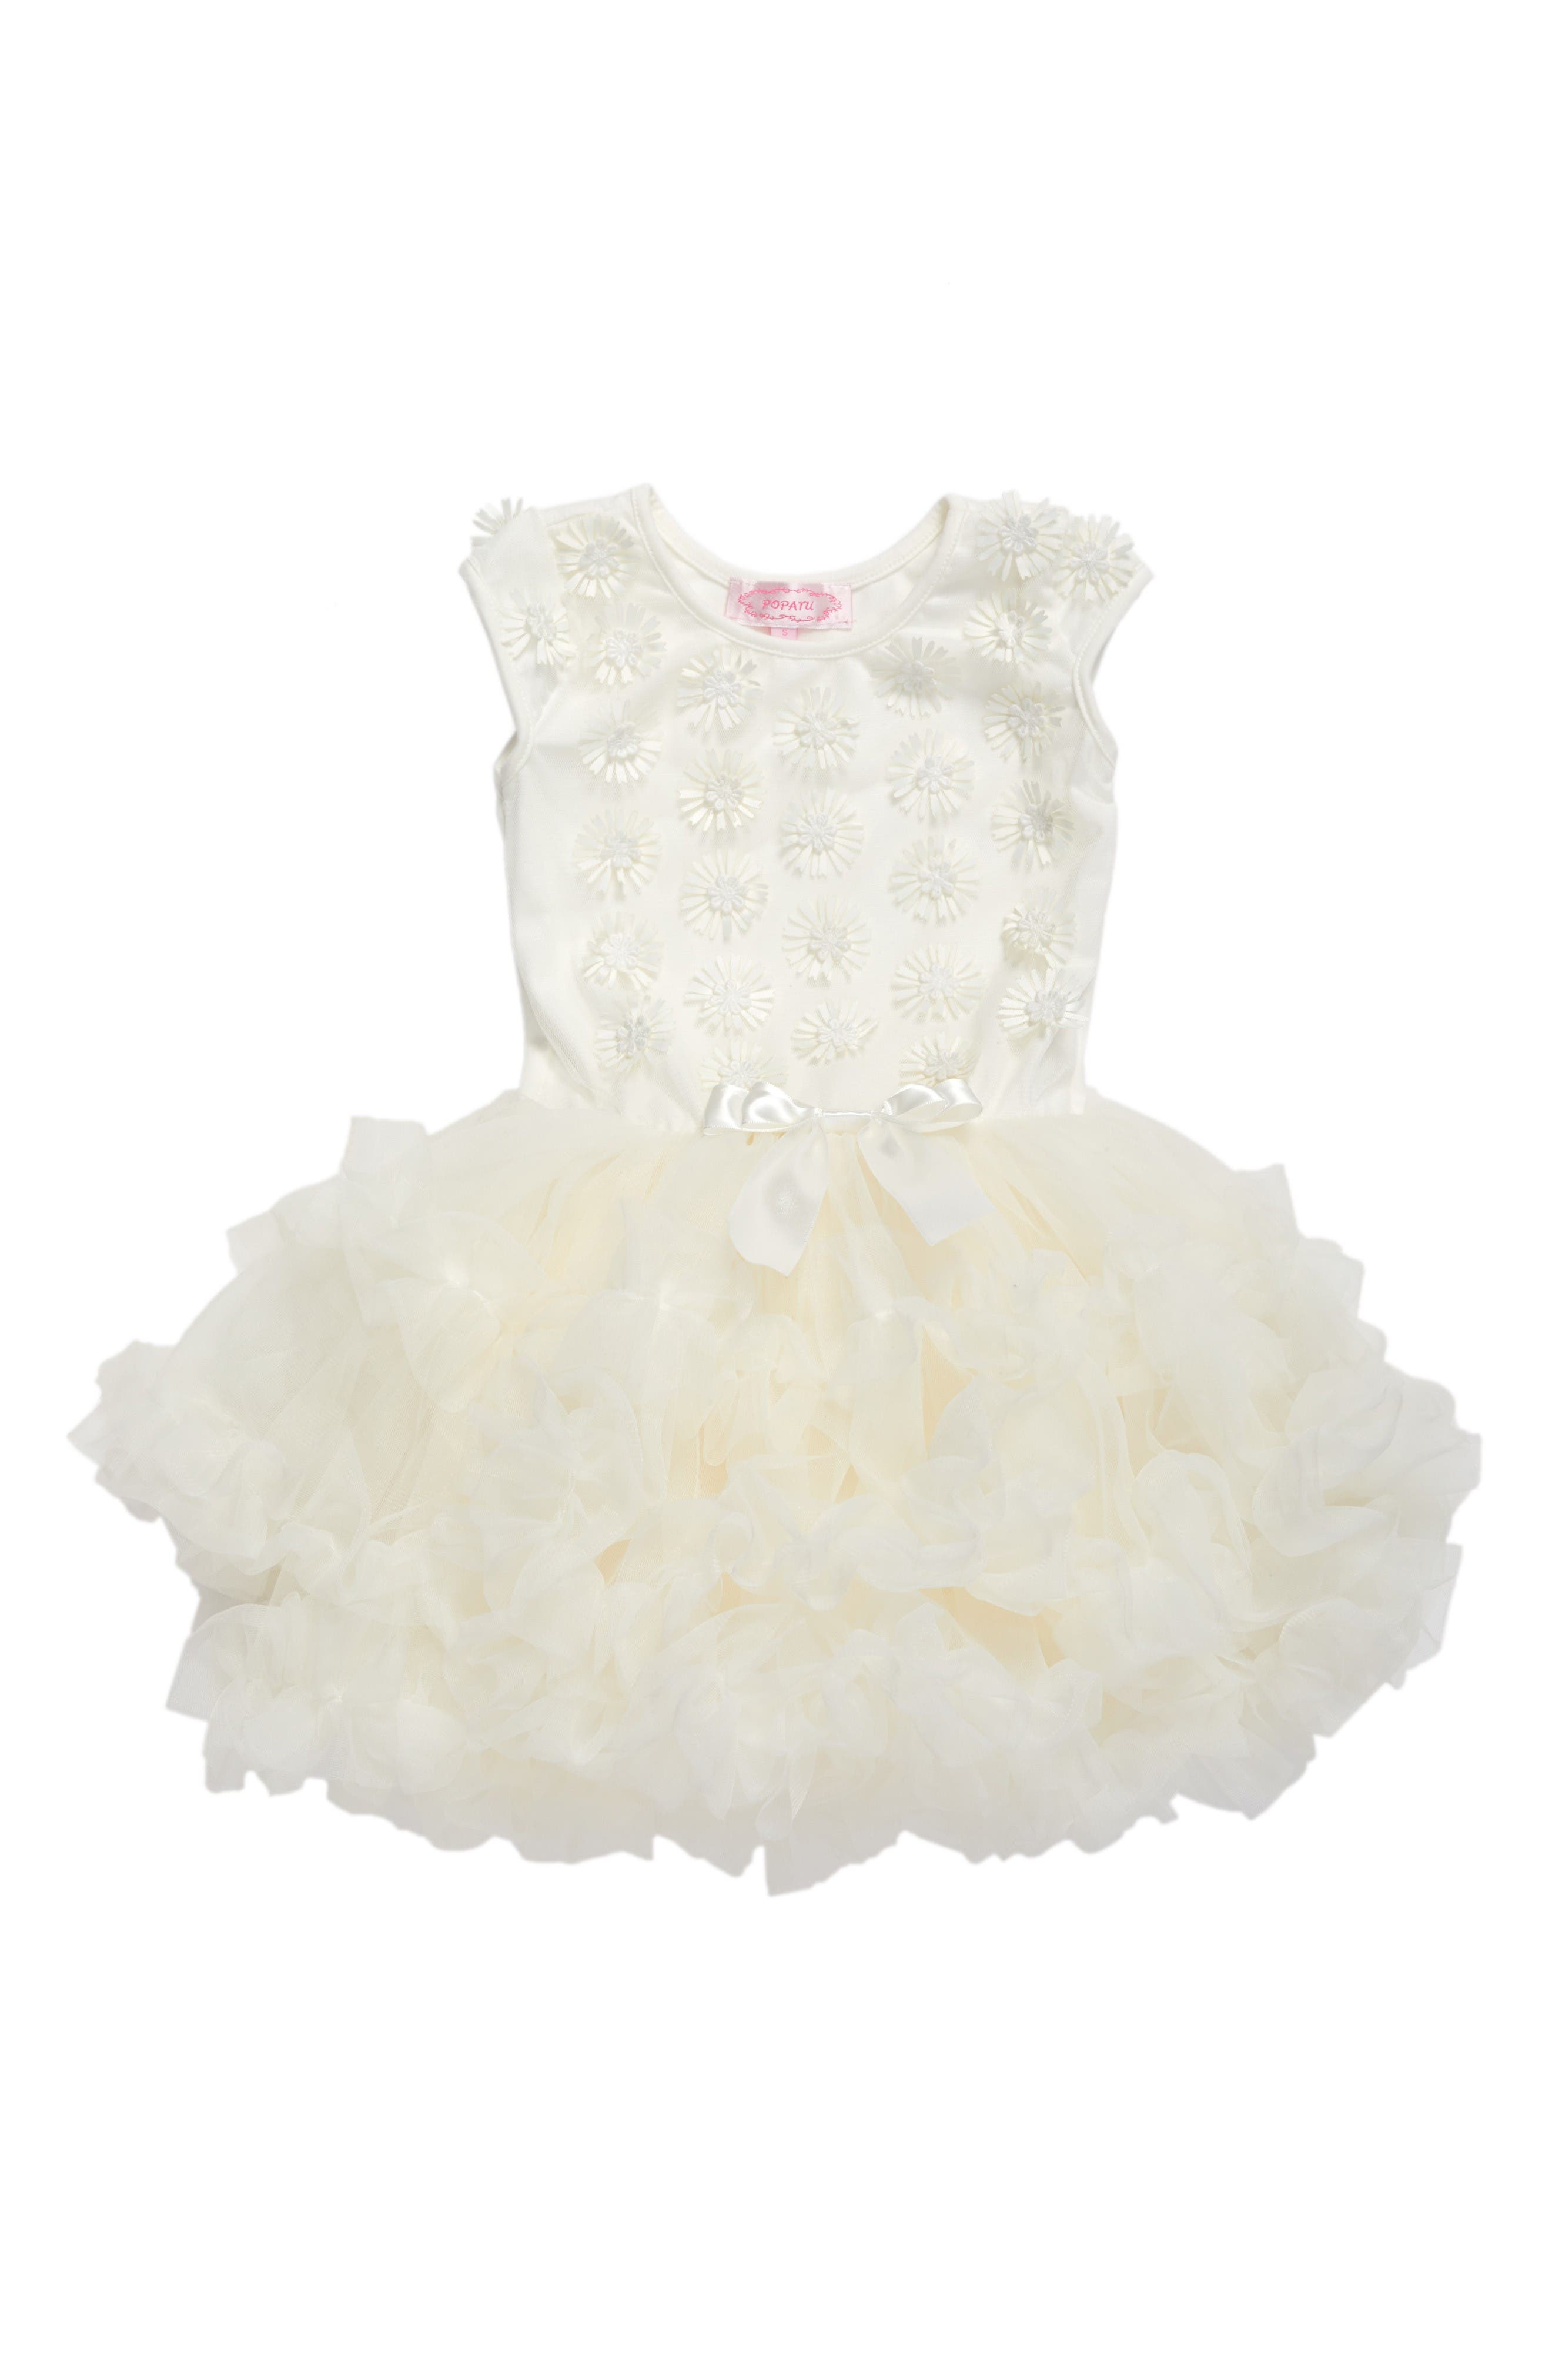 Alternate Image 1 Selected - Popatu White Daisy Tutu Dress (Baby Girls)